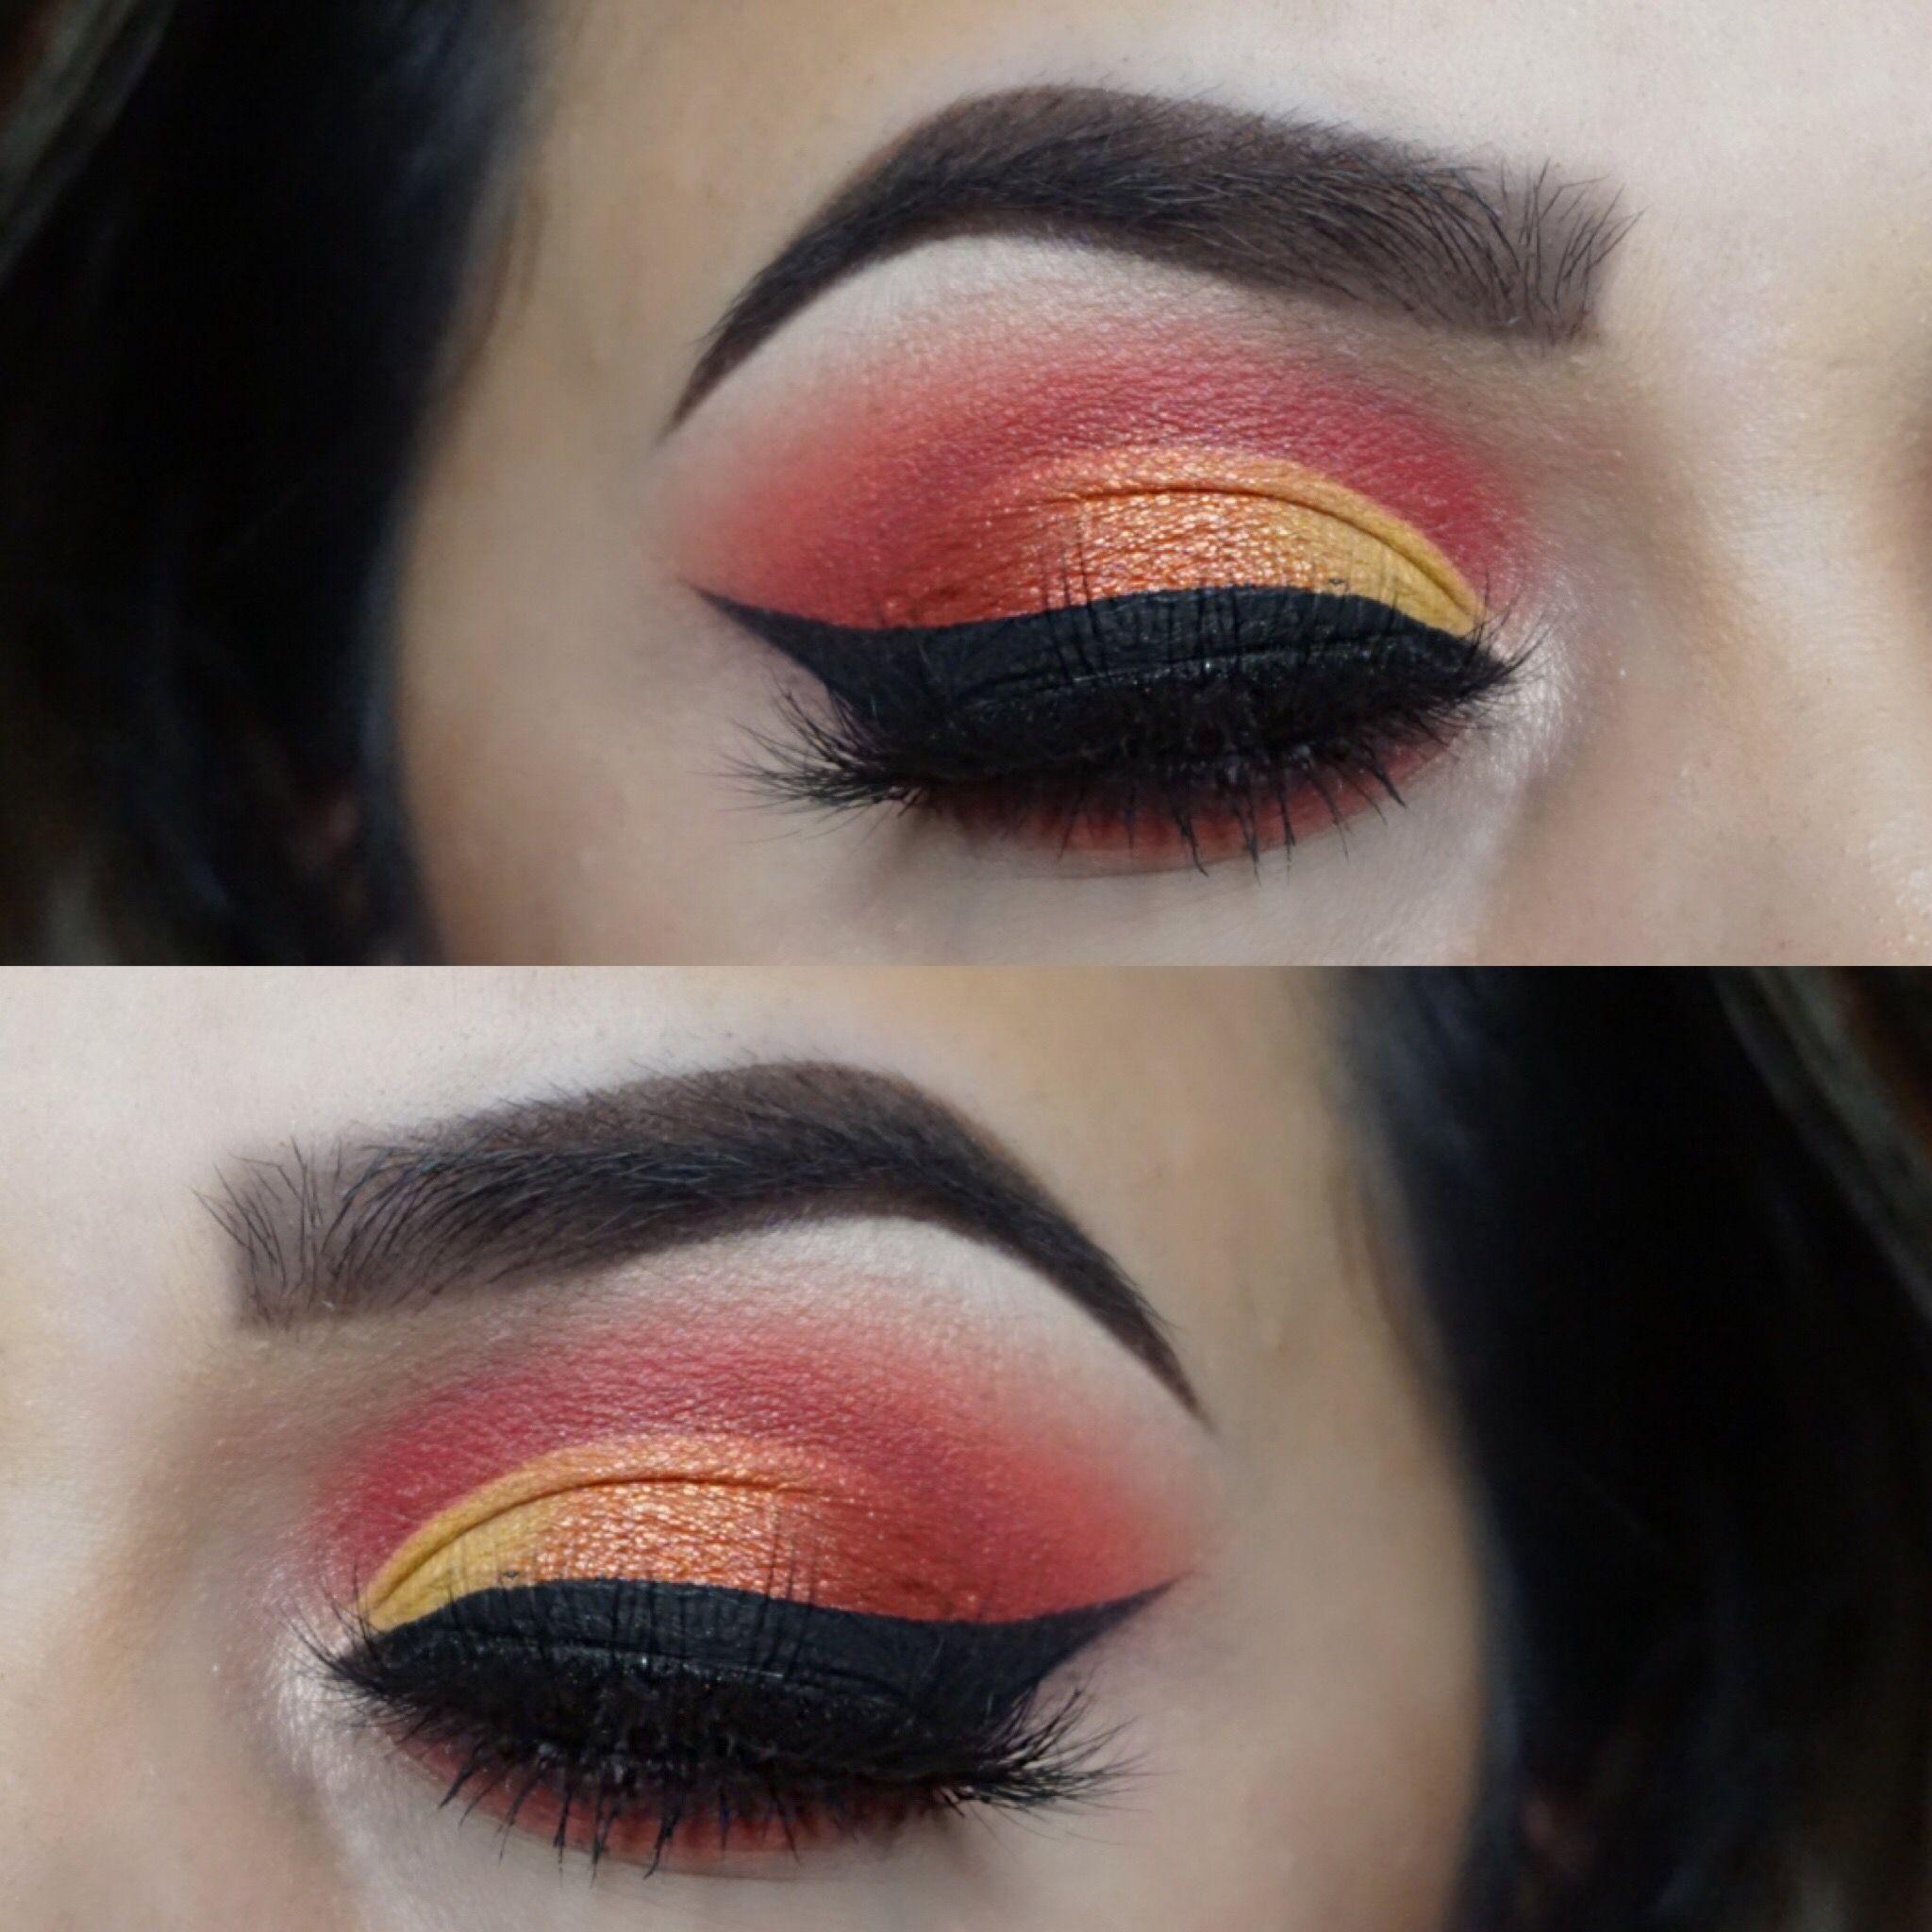 Hot Cheeto eyeshadow look! Flaming hot. Used the Morphe